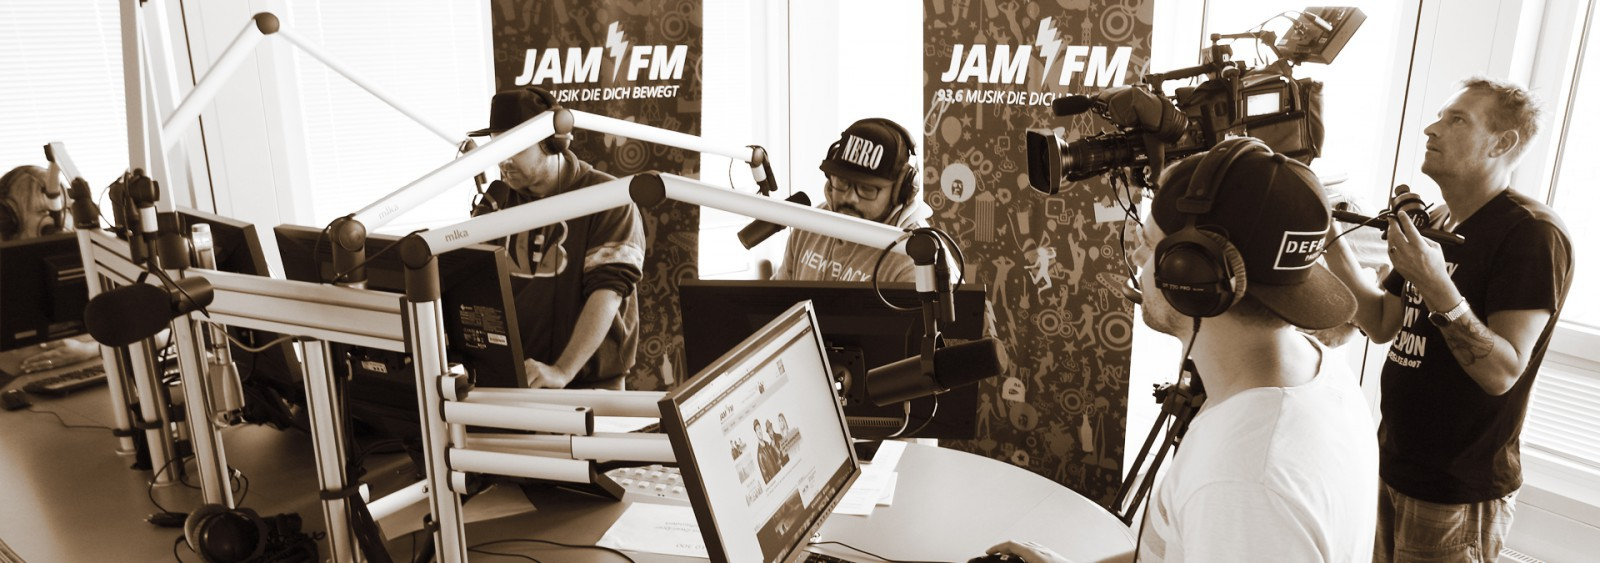 Shooting at the radio studio of Jam FM Berlin